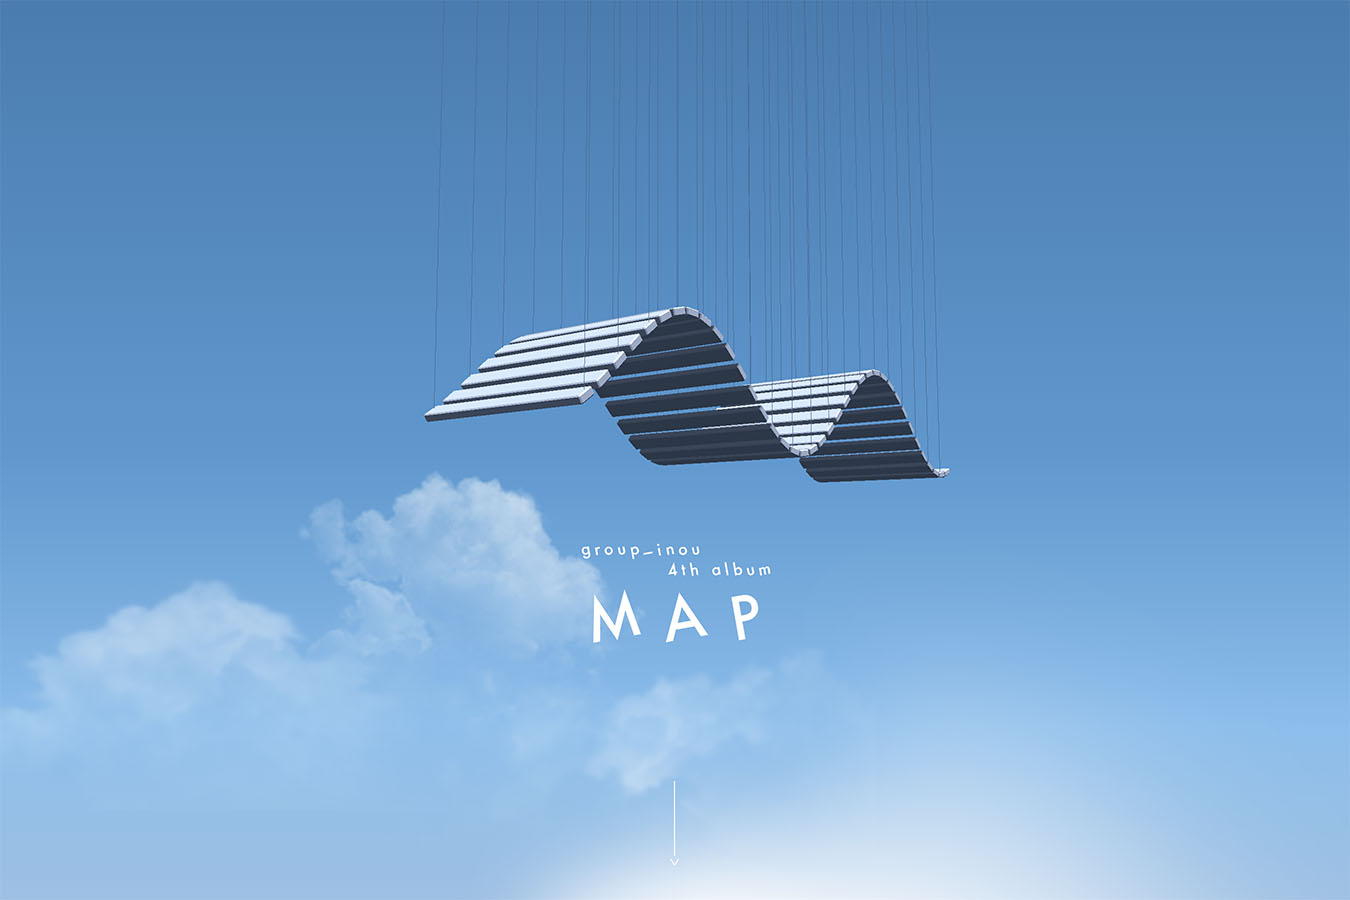 group_inou / MAP